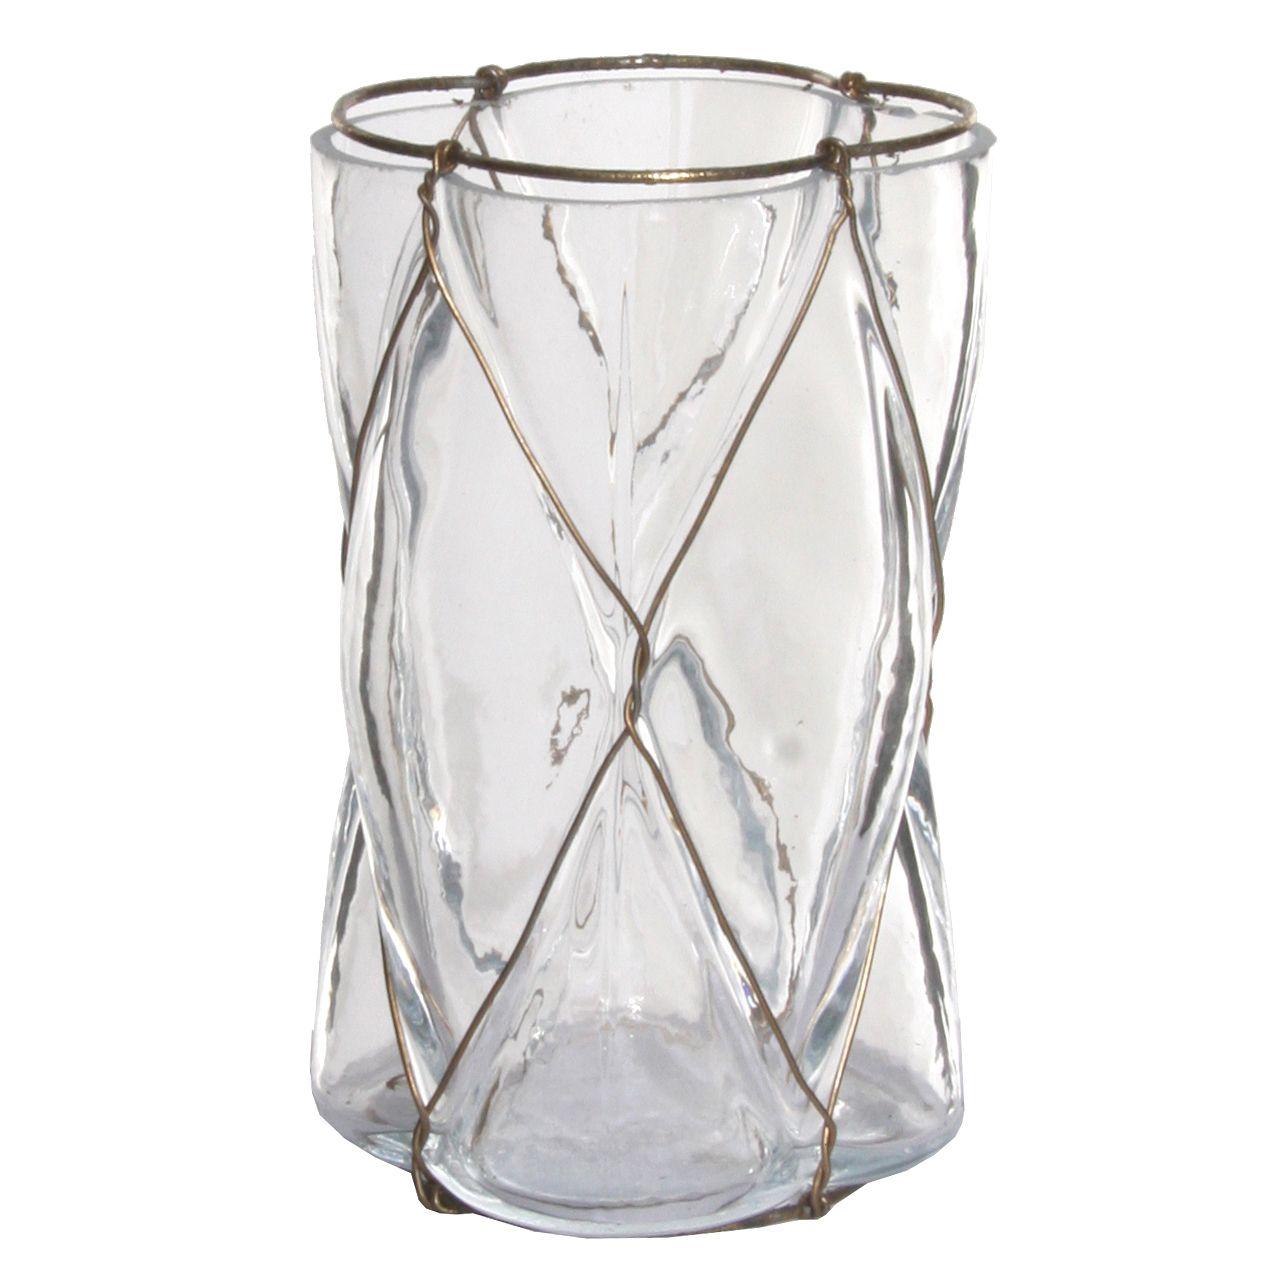 LYSLYKT/VASE GLASS H13,5CM